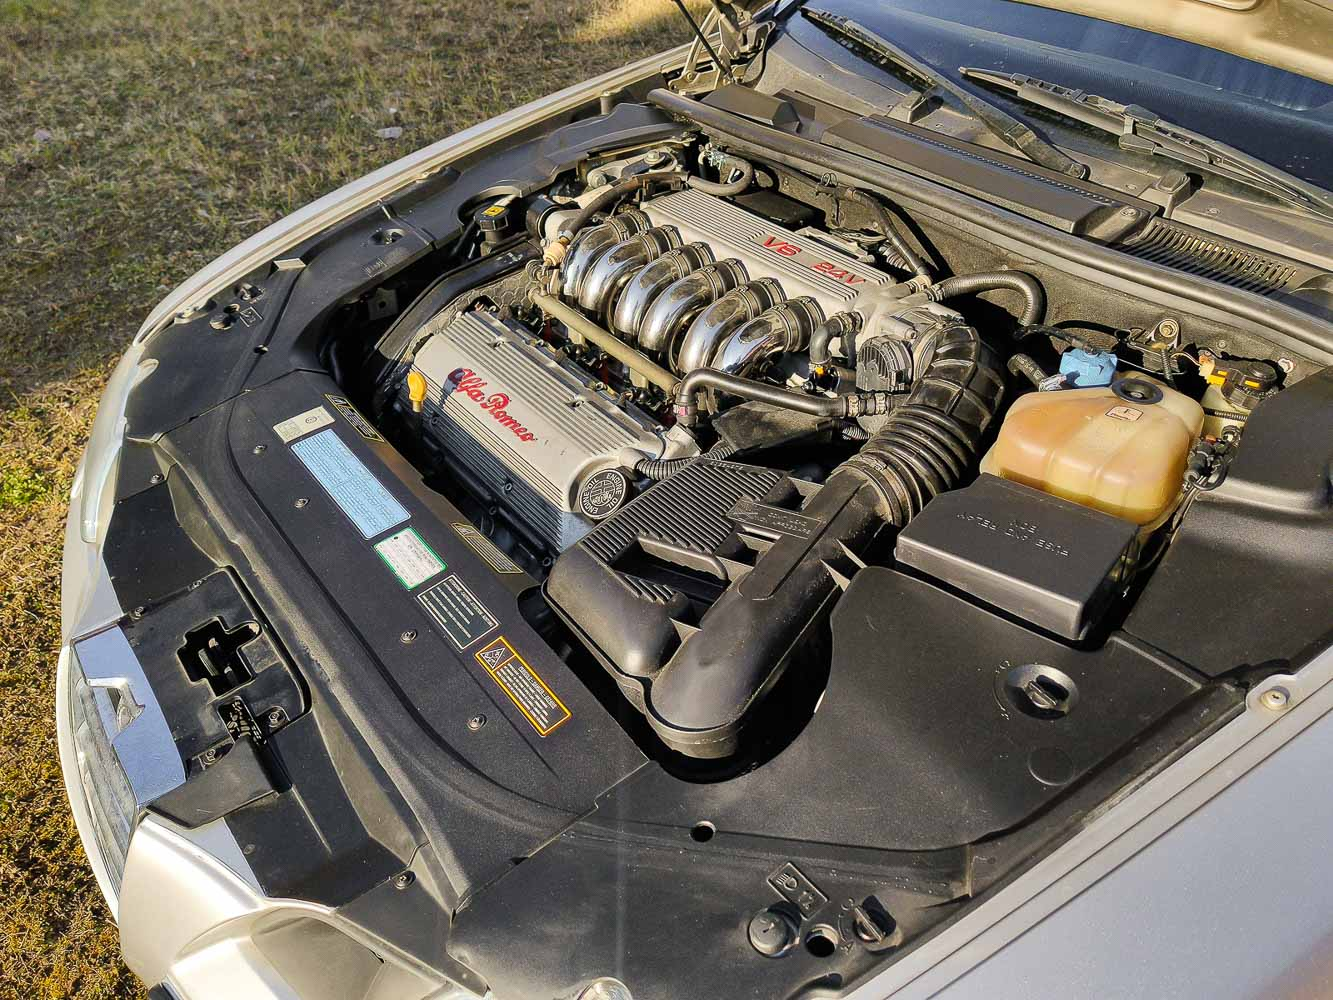 Alfa Romeo 166 motor